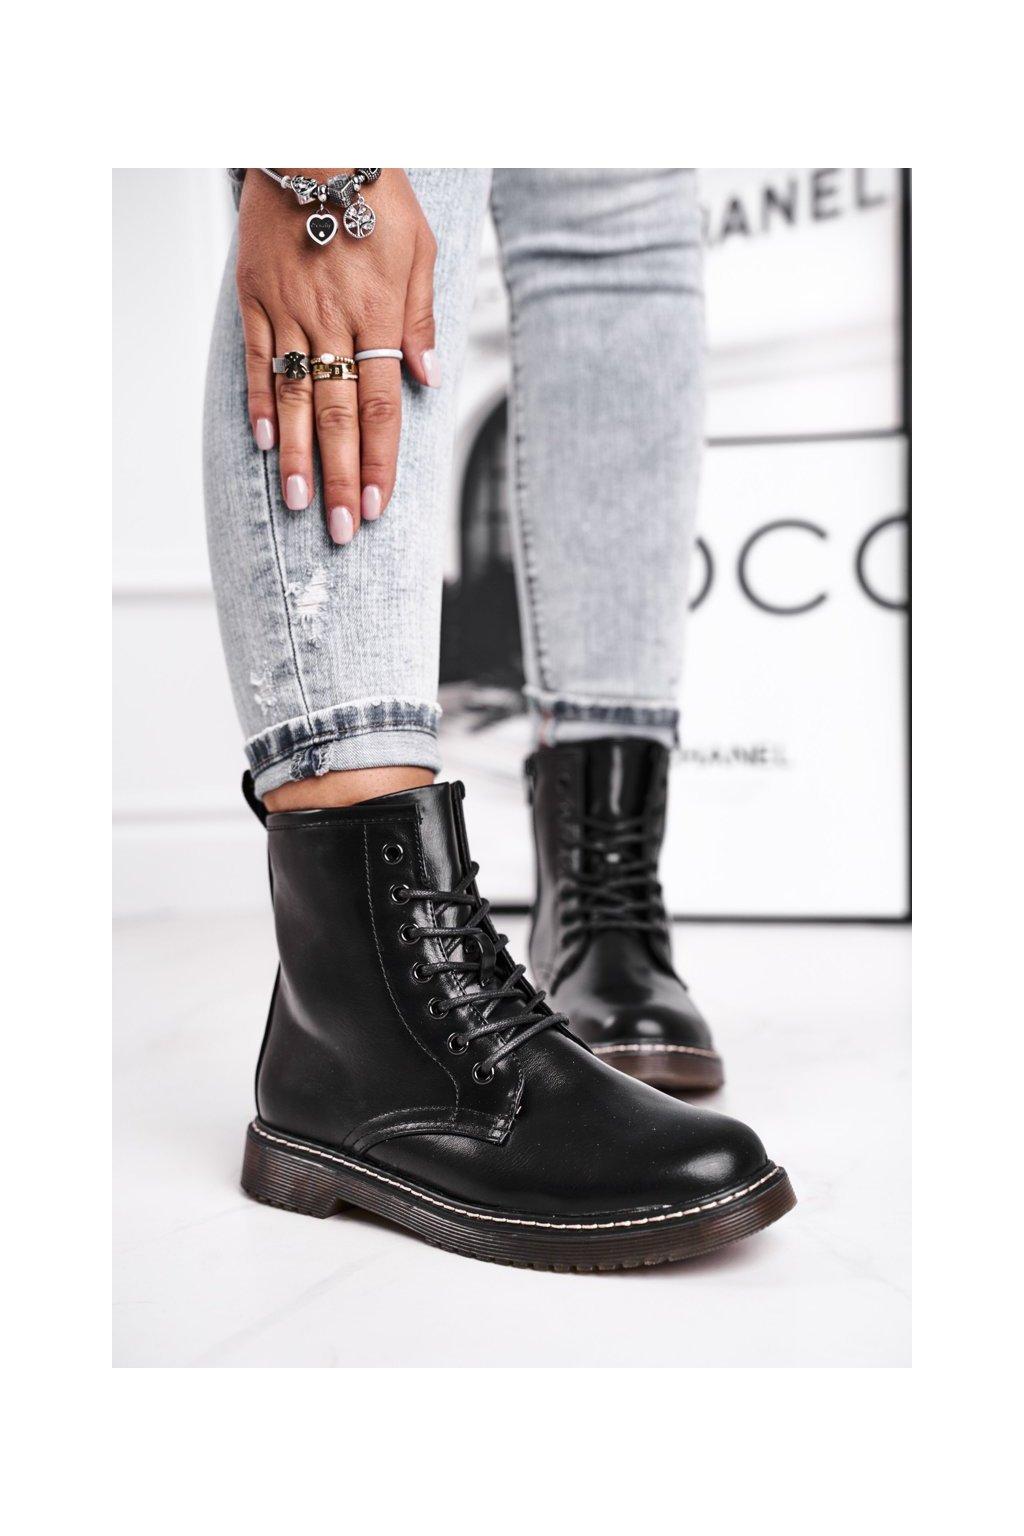 Členkové topánky na podpätku farba čierna kód obuvi 20BT35-3002 BLK MAT